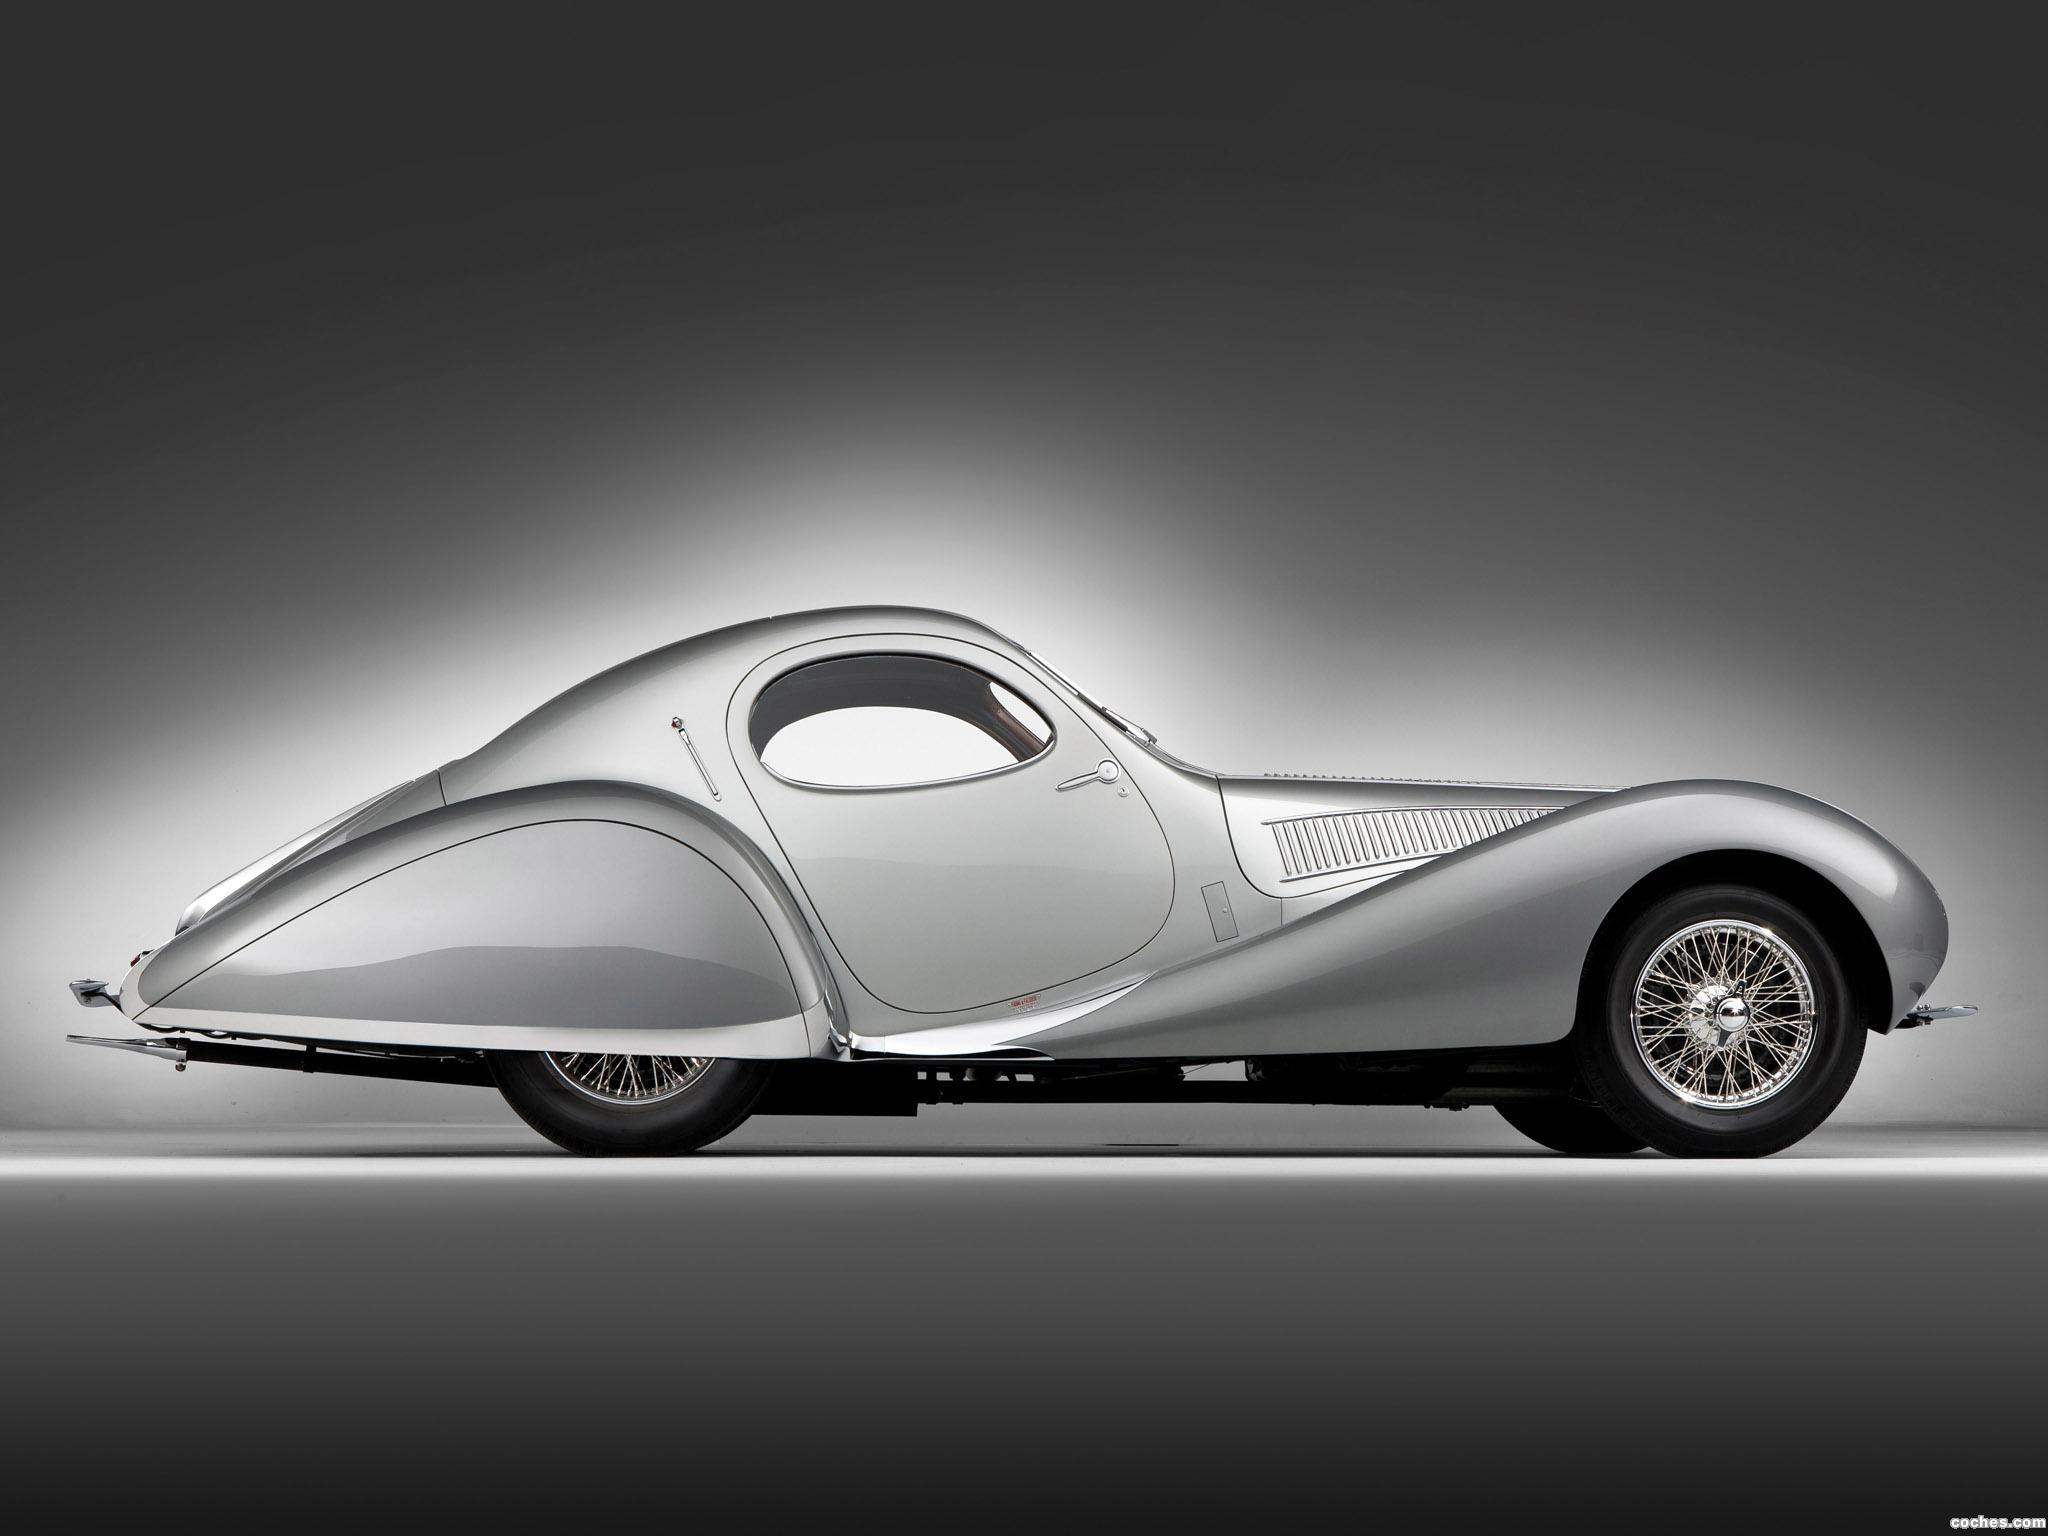 Foto 11 de Talbot Lago T150C Figoni et Falaschi 1938